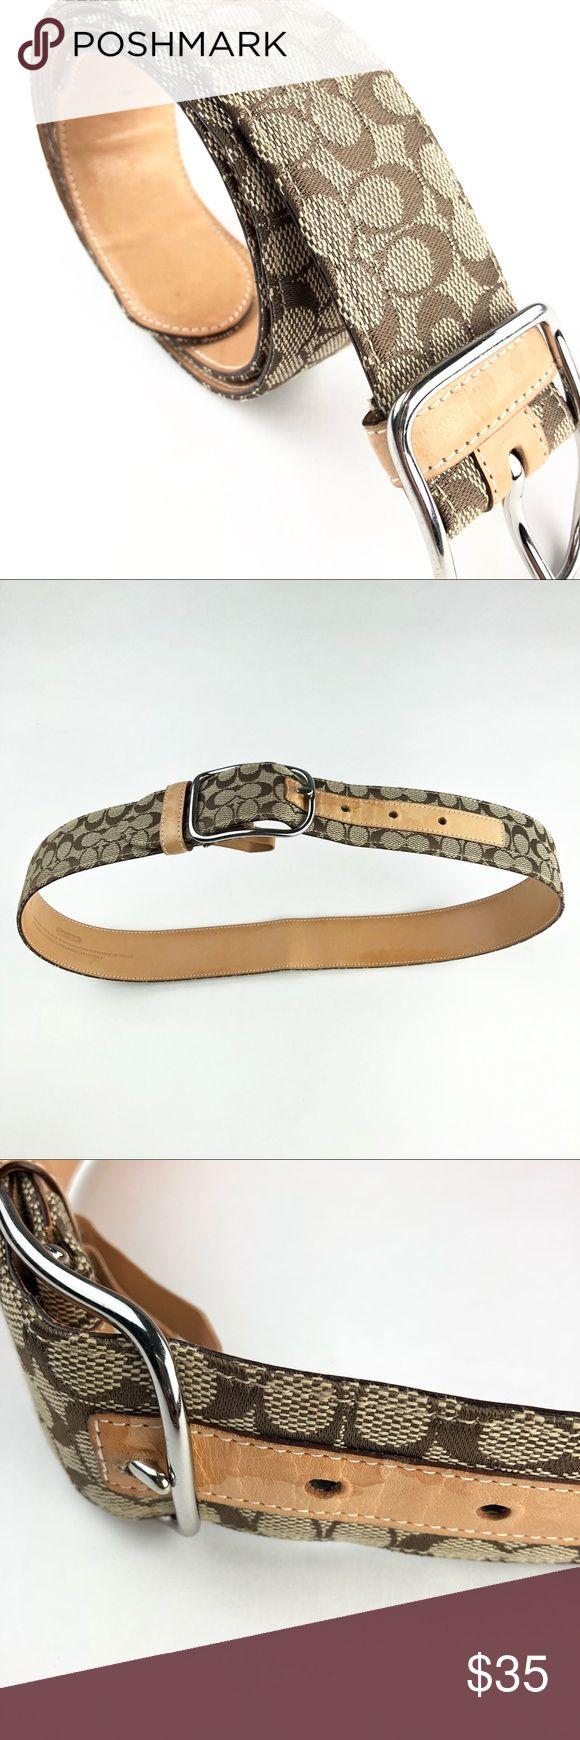 "Coach Belt Genuine Leather Trim Monogram Canvas Coach Belt Women's Small Brown Jacquard Genuine Leather Trim Monogram Canvas  Measures 33"" Long and 1.5"" wide Coach Accessories Belts"